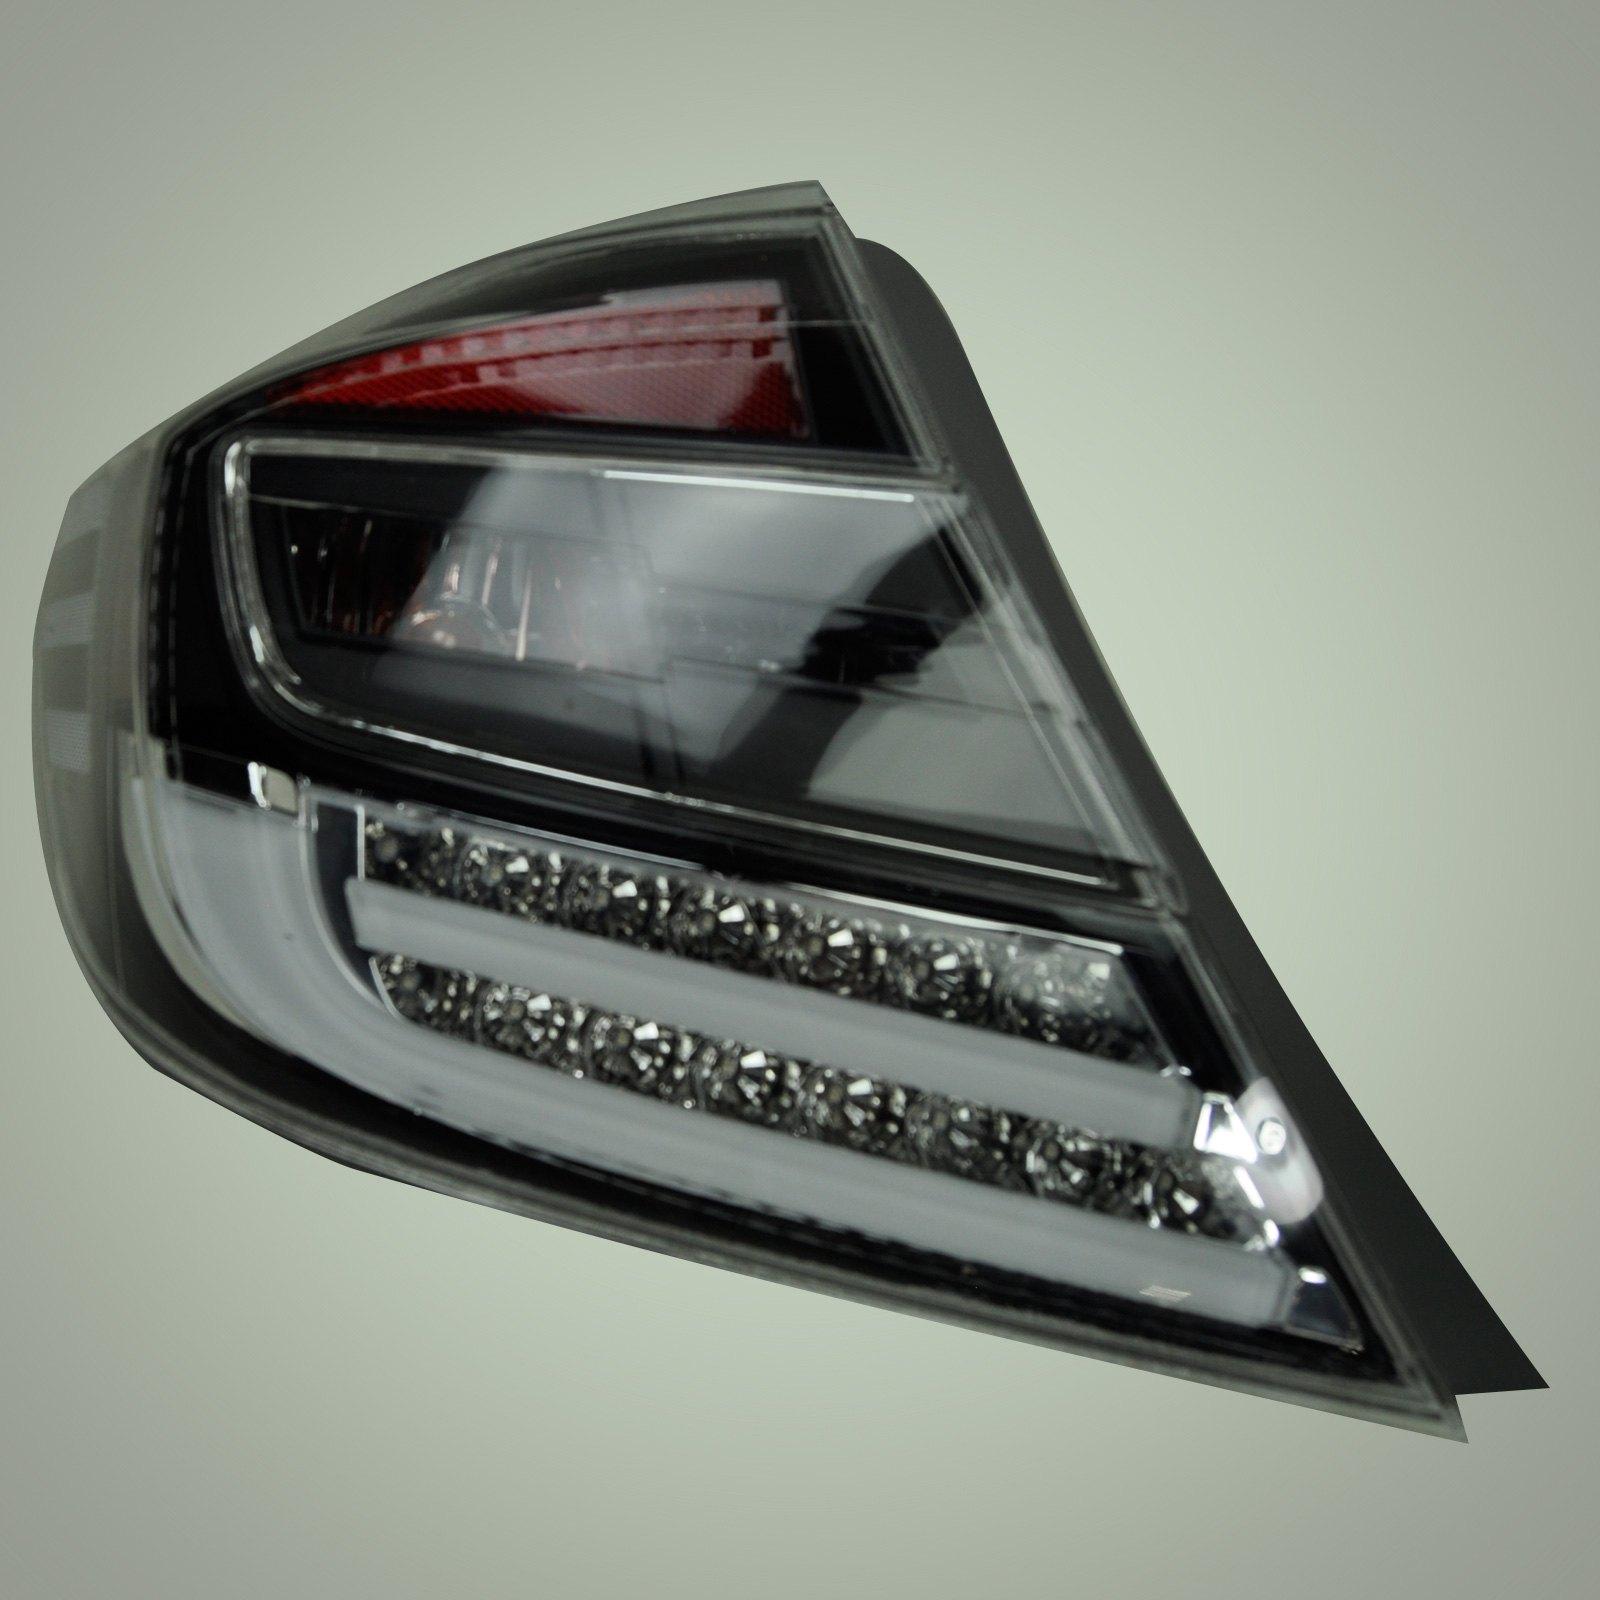 New 2012 Honda Civic 4 Dr Black Led Tail Lights By Anzo Ebay